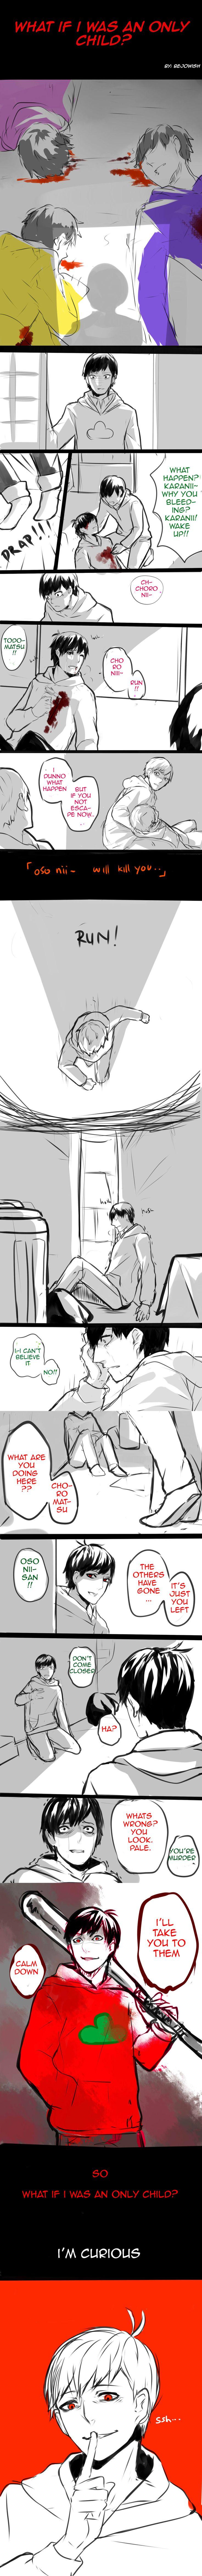 Short Comic: Osomatsu-san by Bejowish on DeviantArt